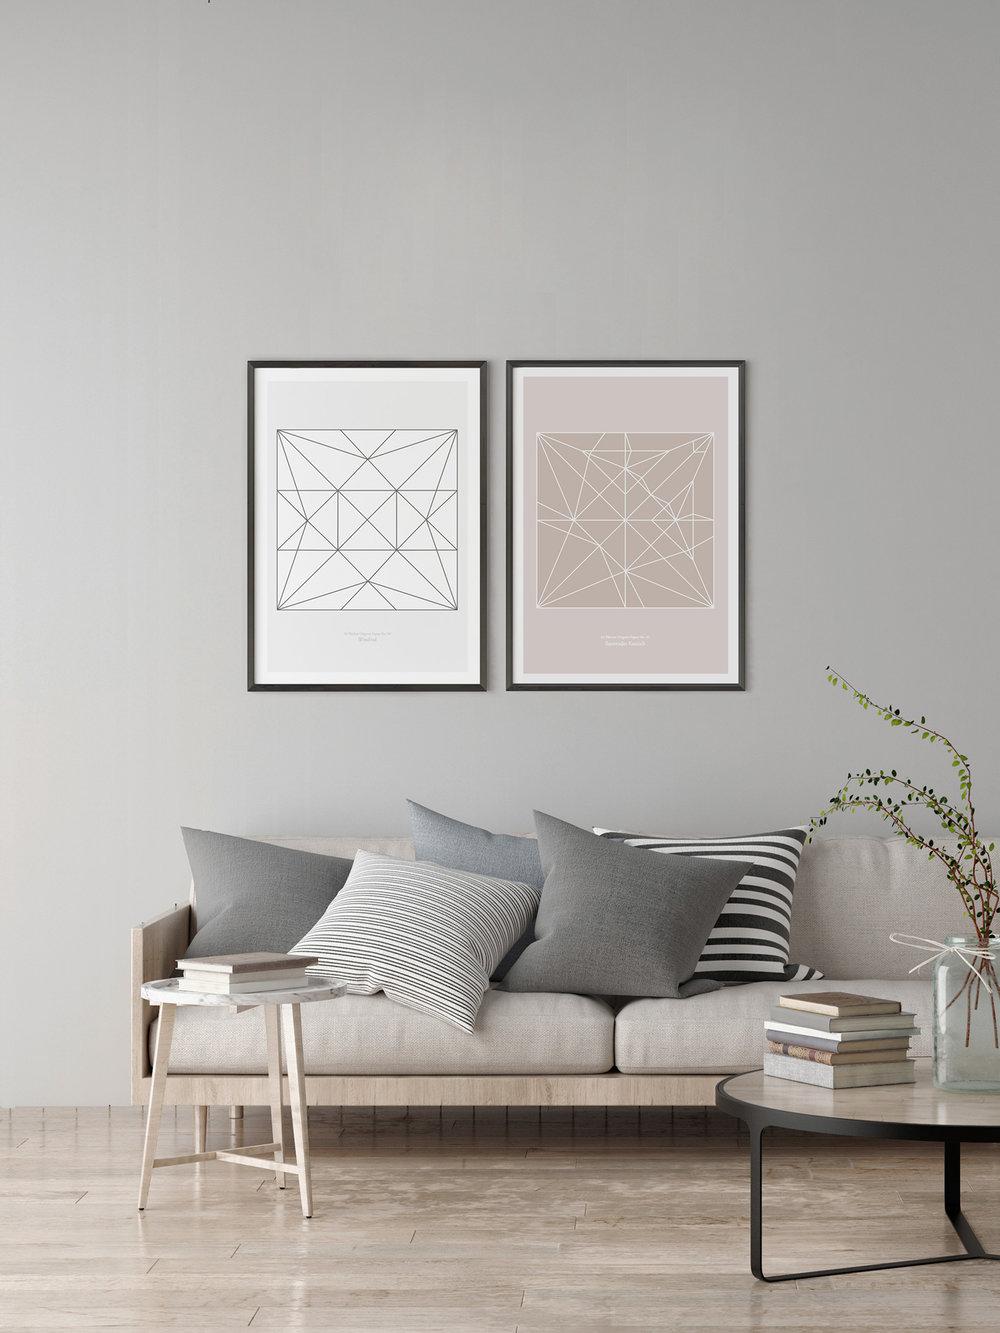 Origami Poster Windrad und Kranich  Origami print Pinwheel and Crane